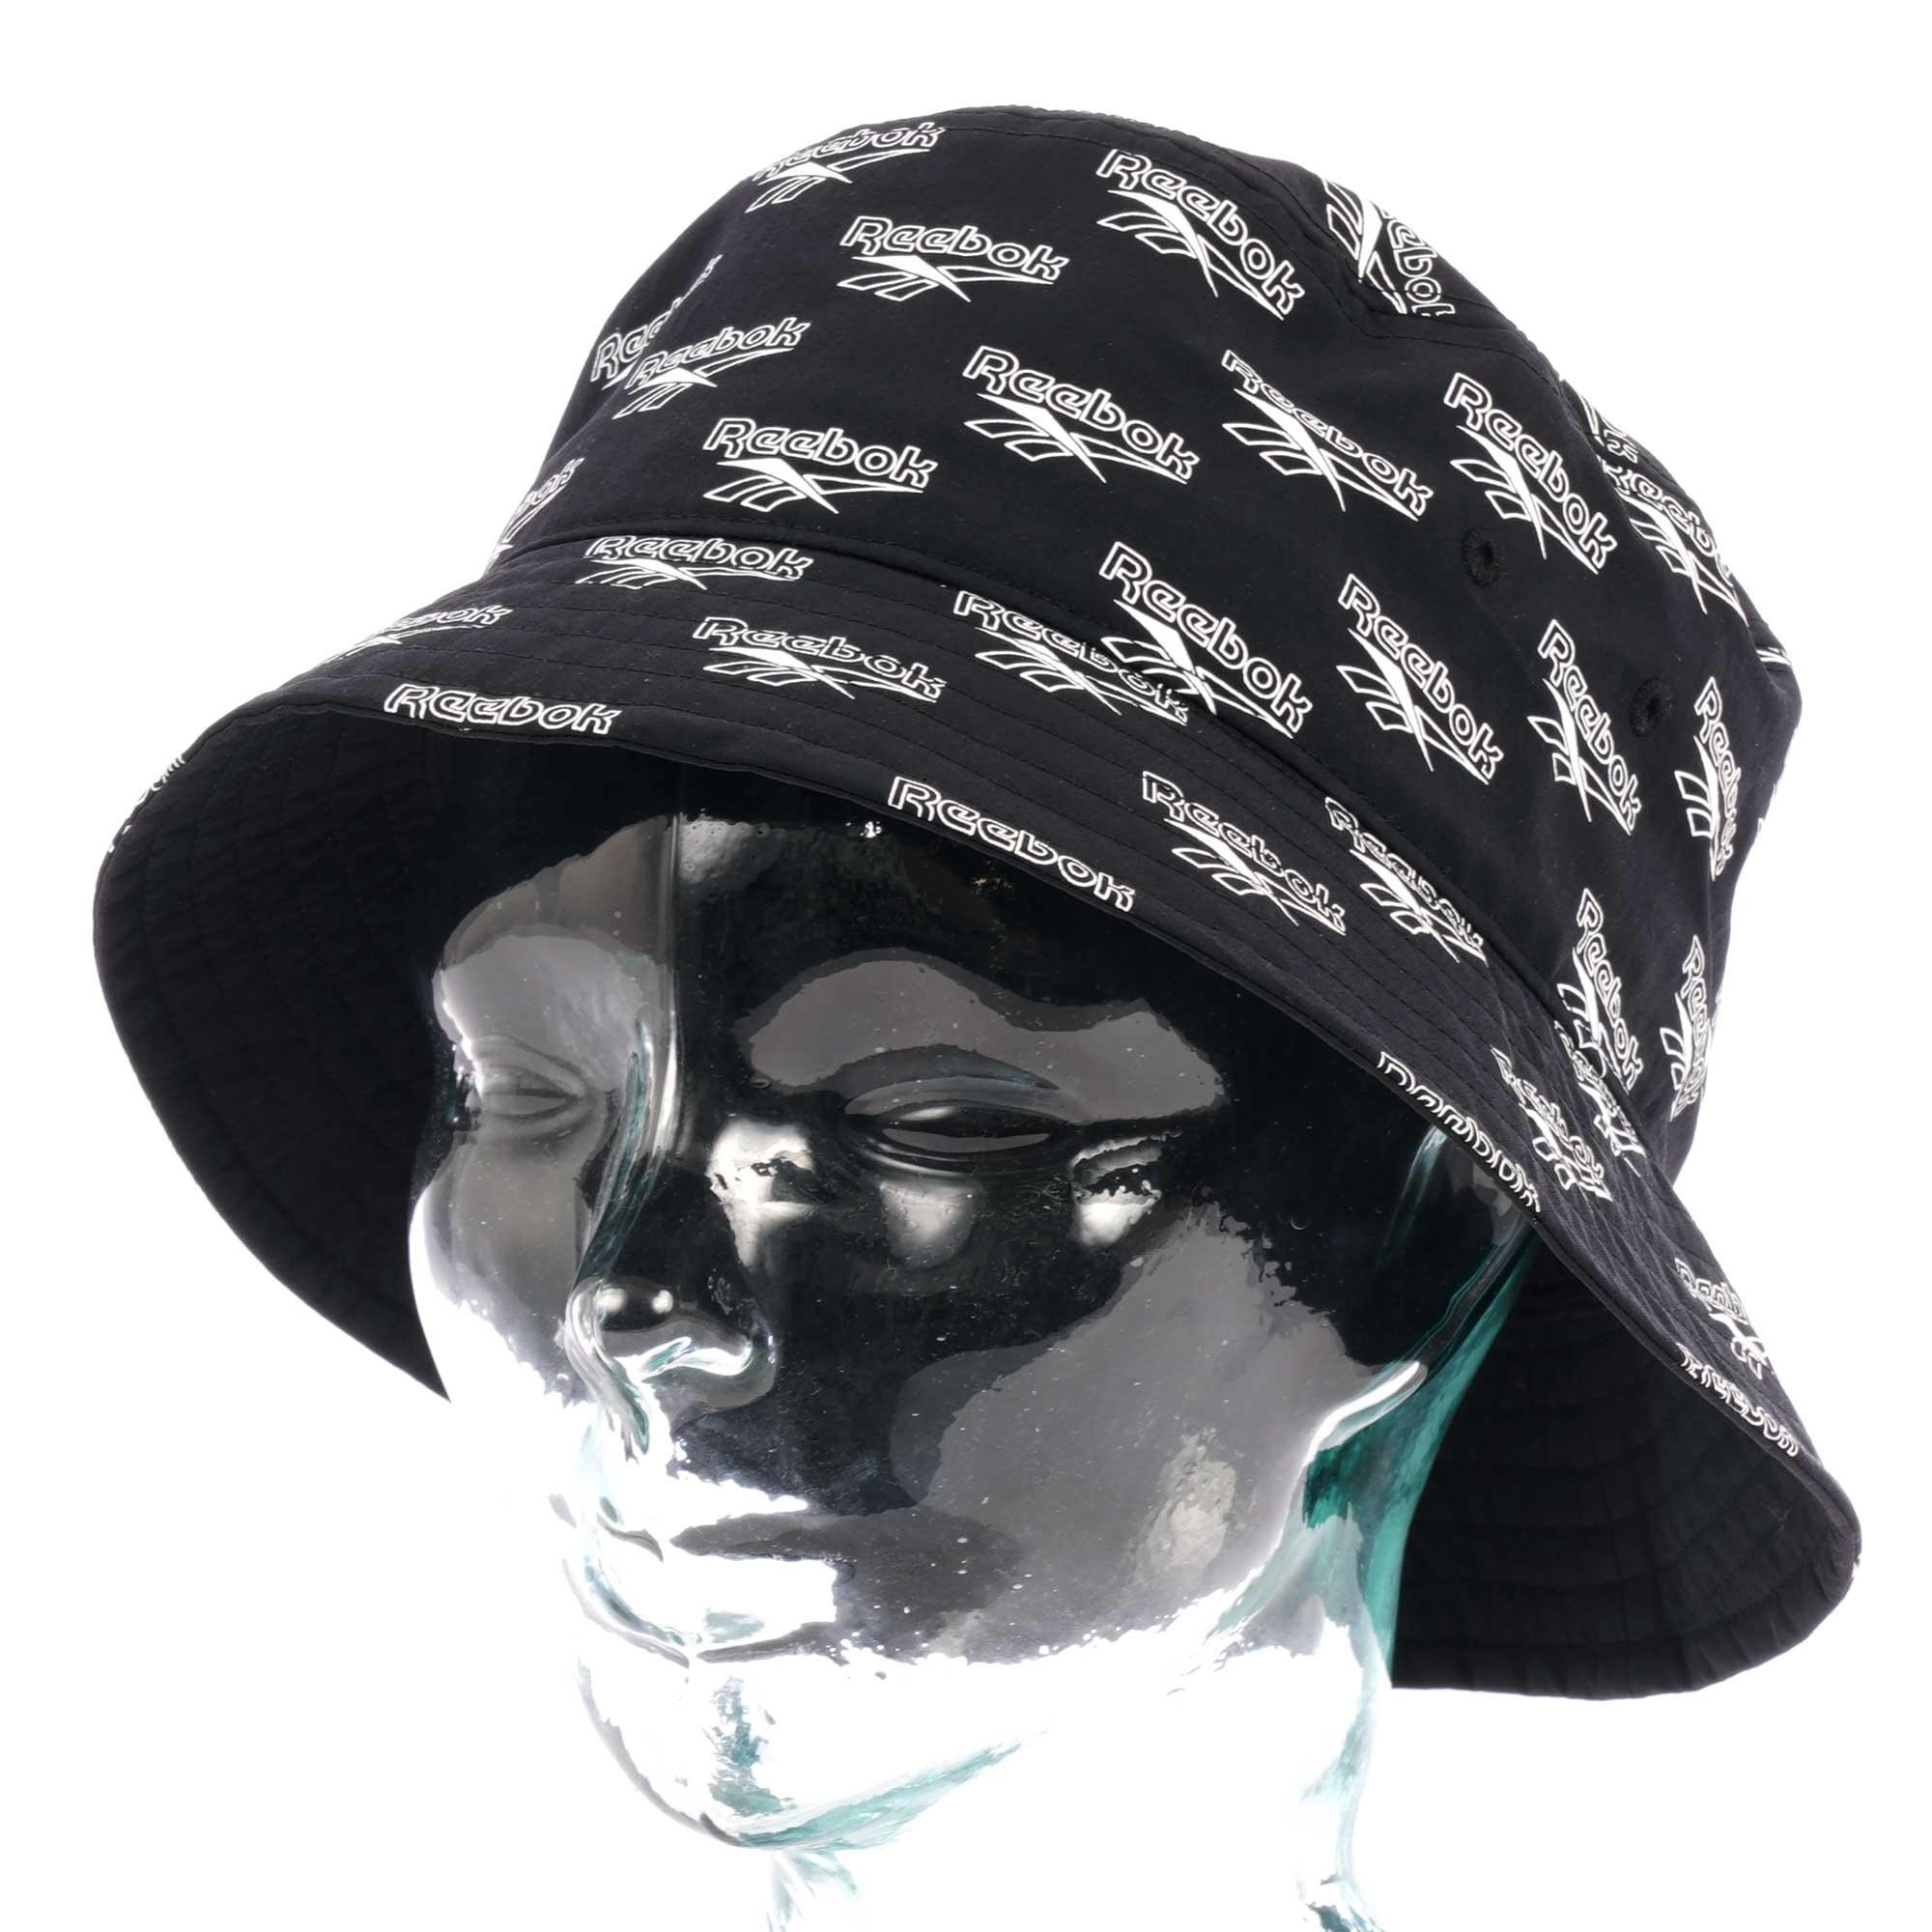 a35328c0ba5 Reebok - Classic Vector Bucket Hat - Black for Men - Lyst. View fullscreen